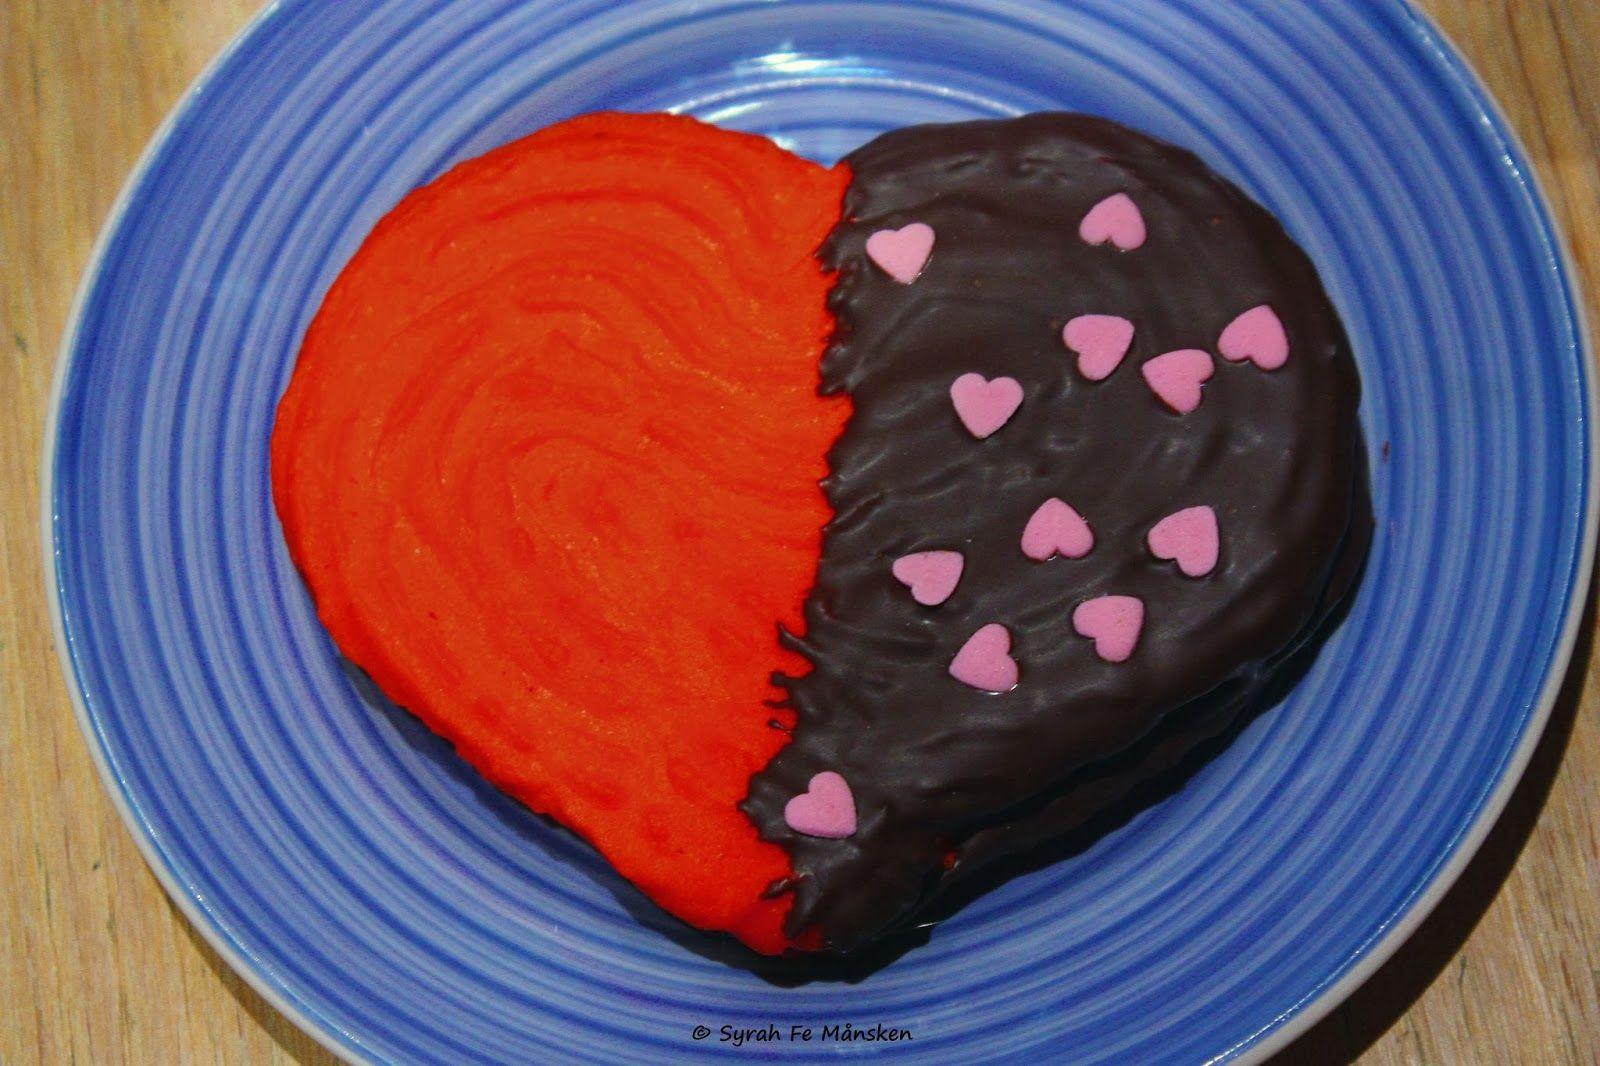 Vegan Valentine's Day ♥ Vegan Valentinstag, Flammendes Herz vegan,  #vegan #valentinesday #valentine